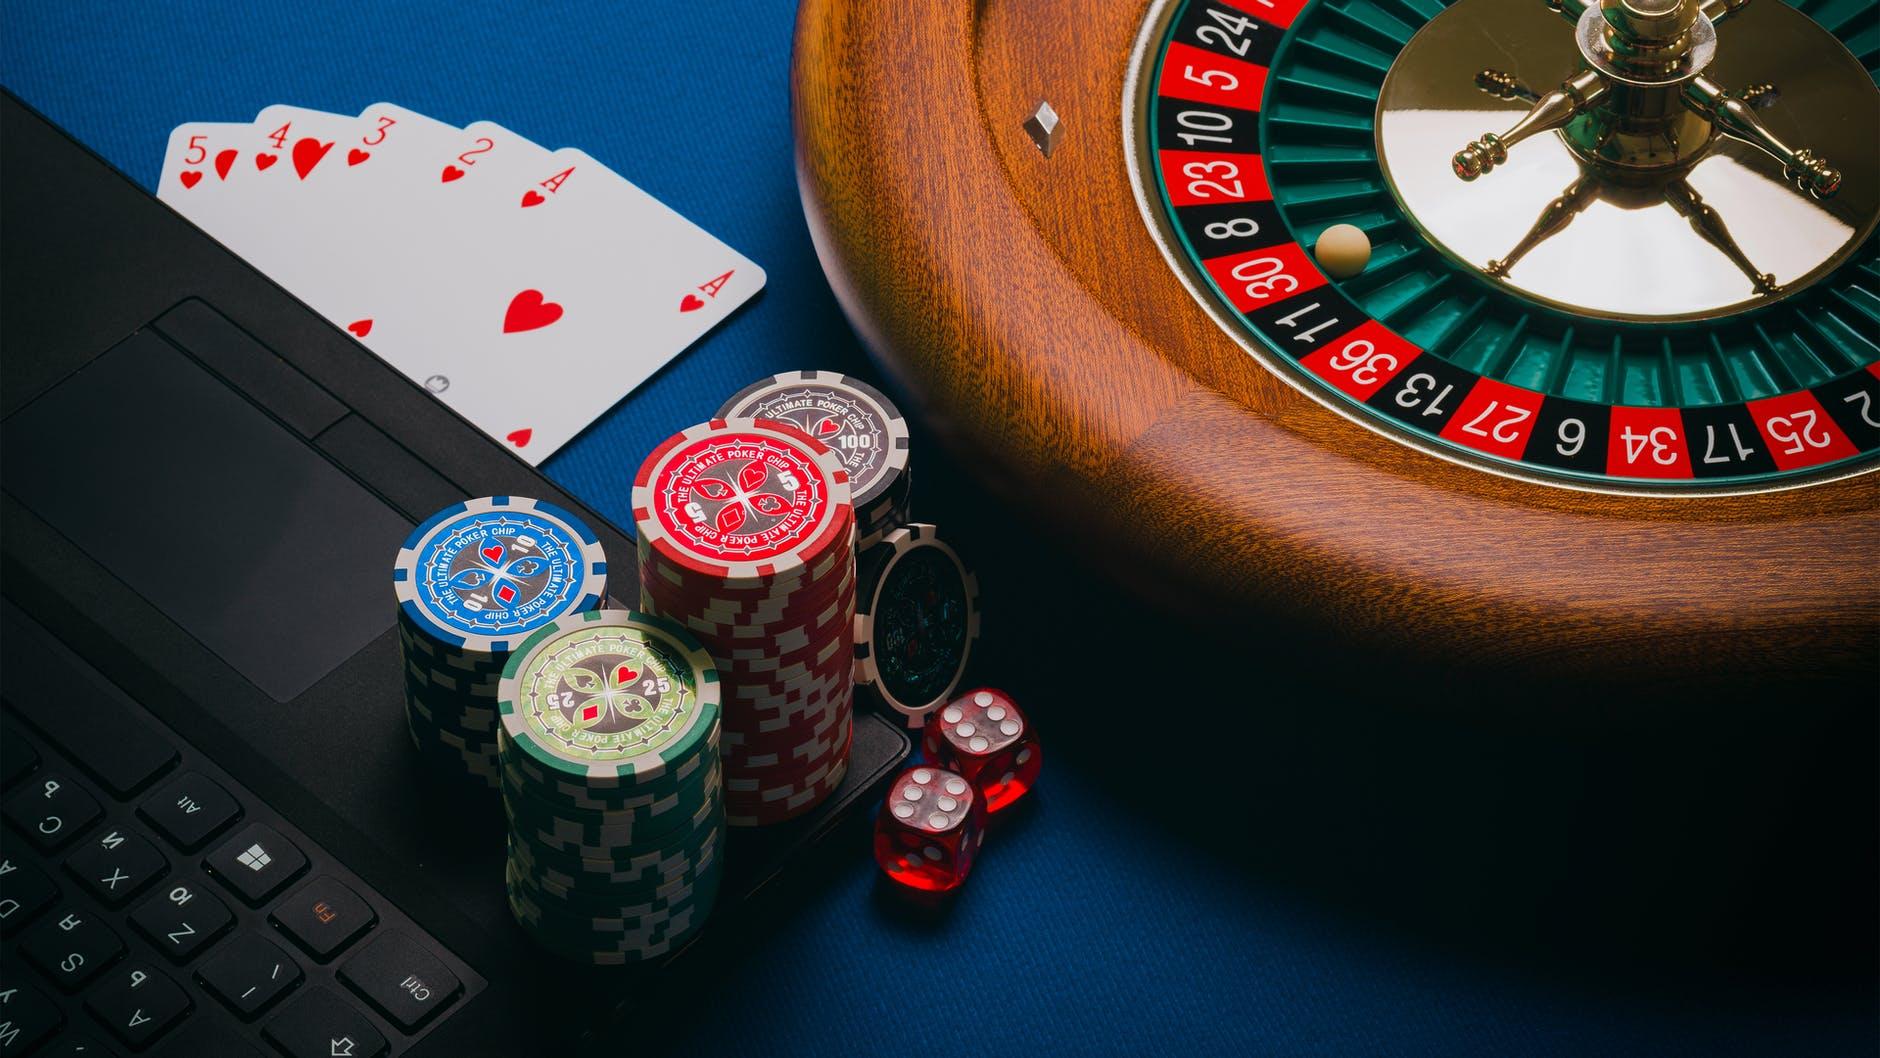 Real Money Casino Games vs Social Casino Games